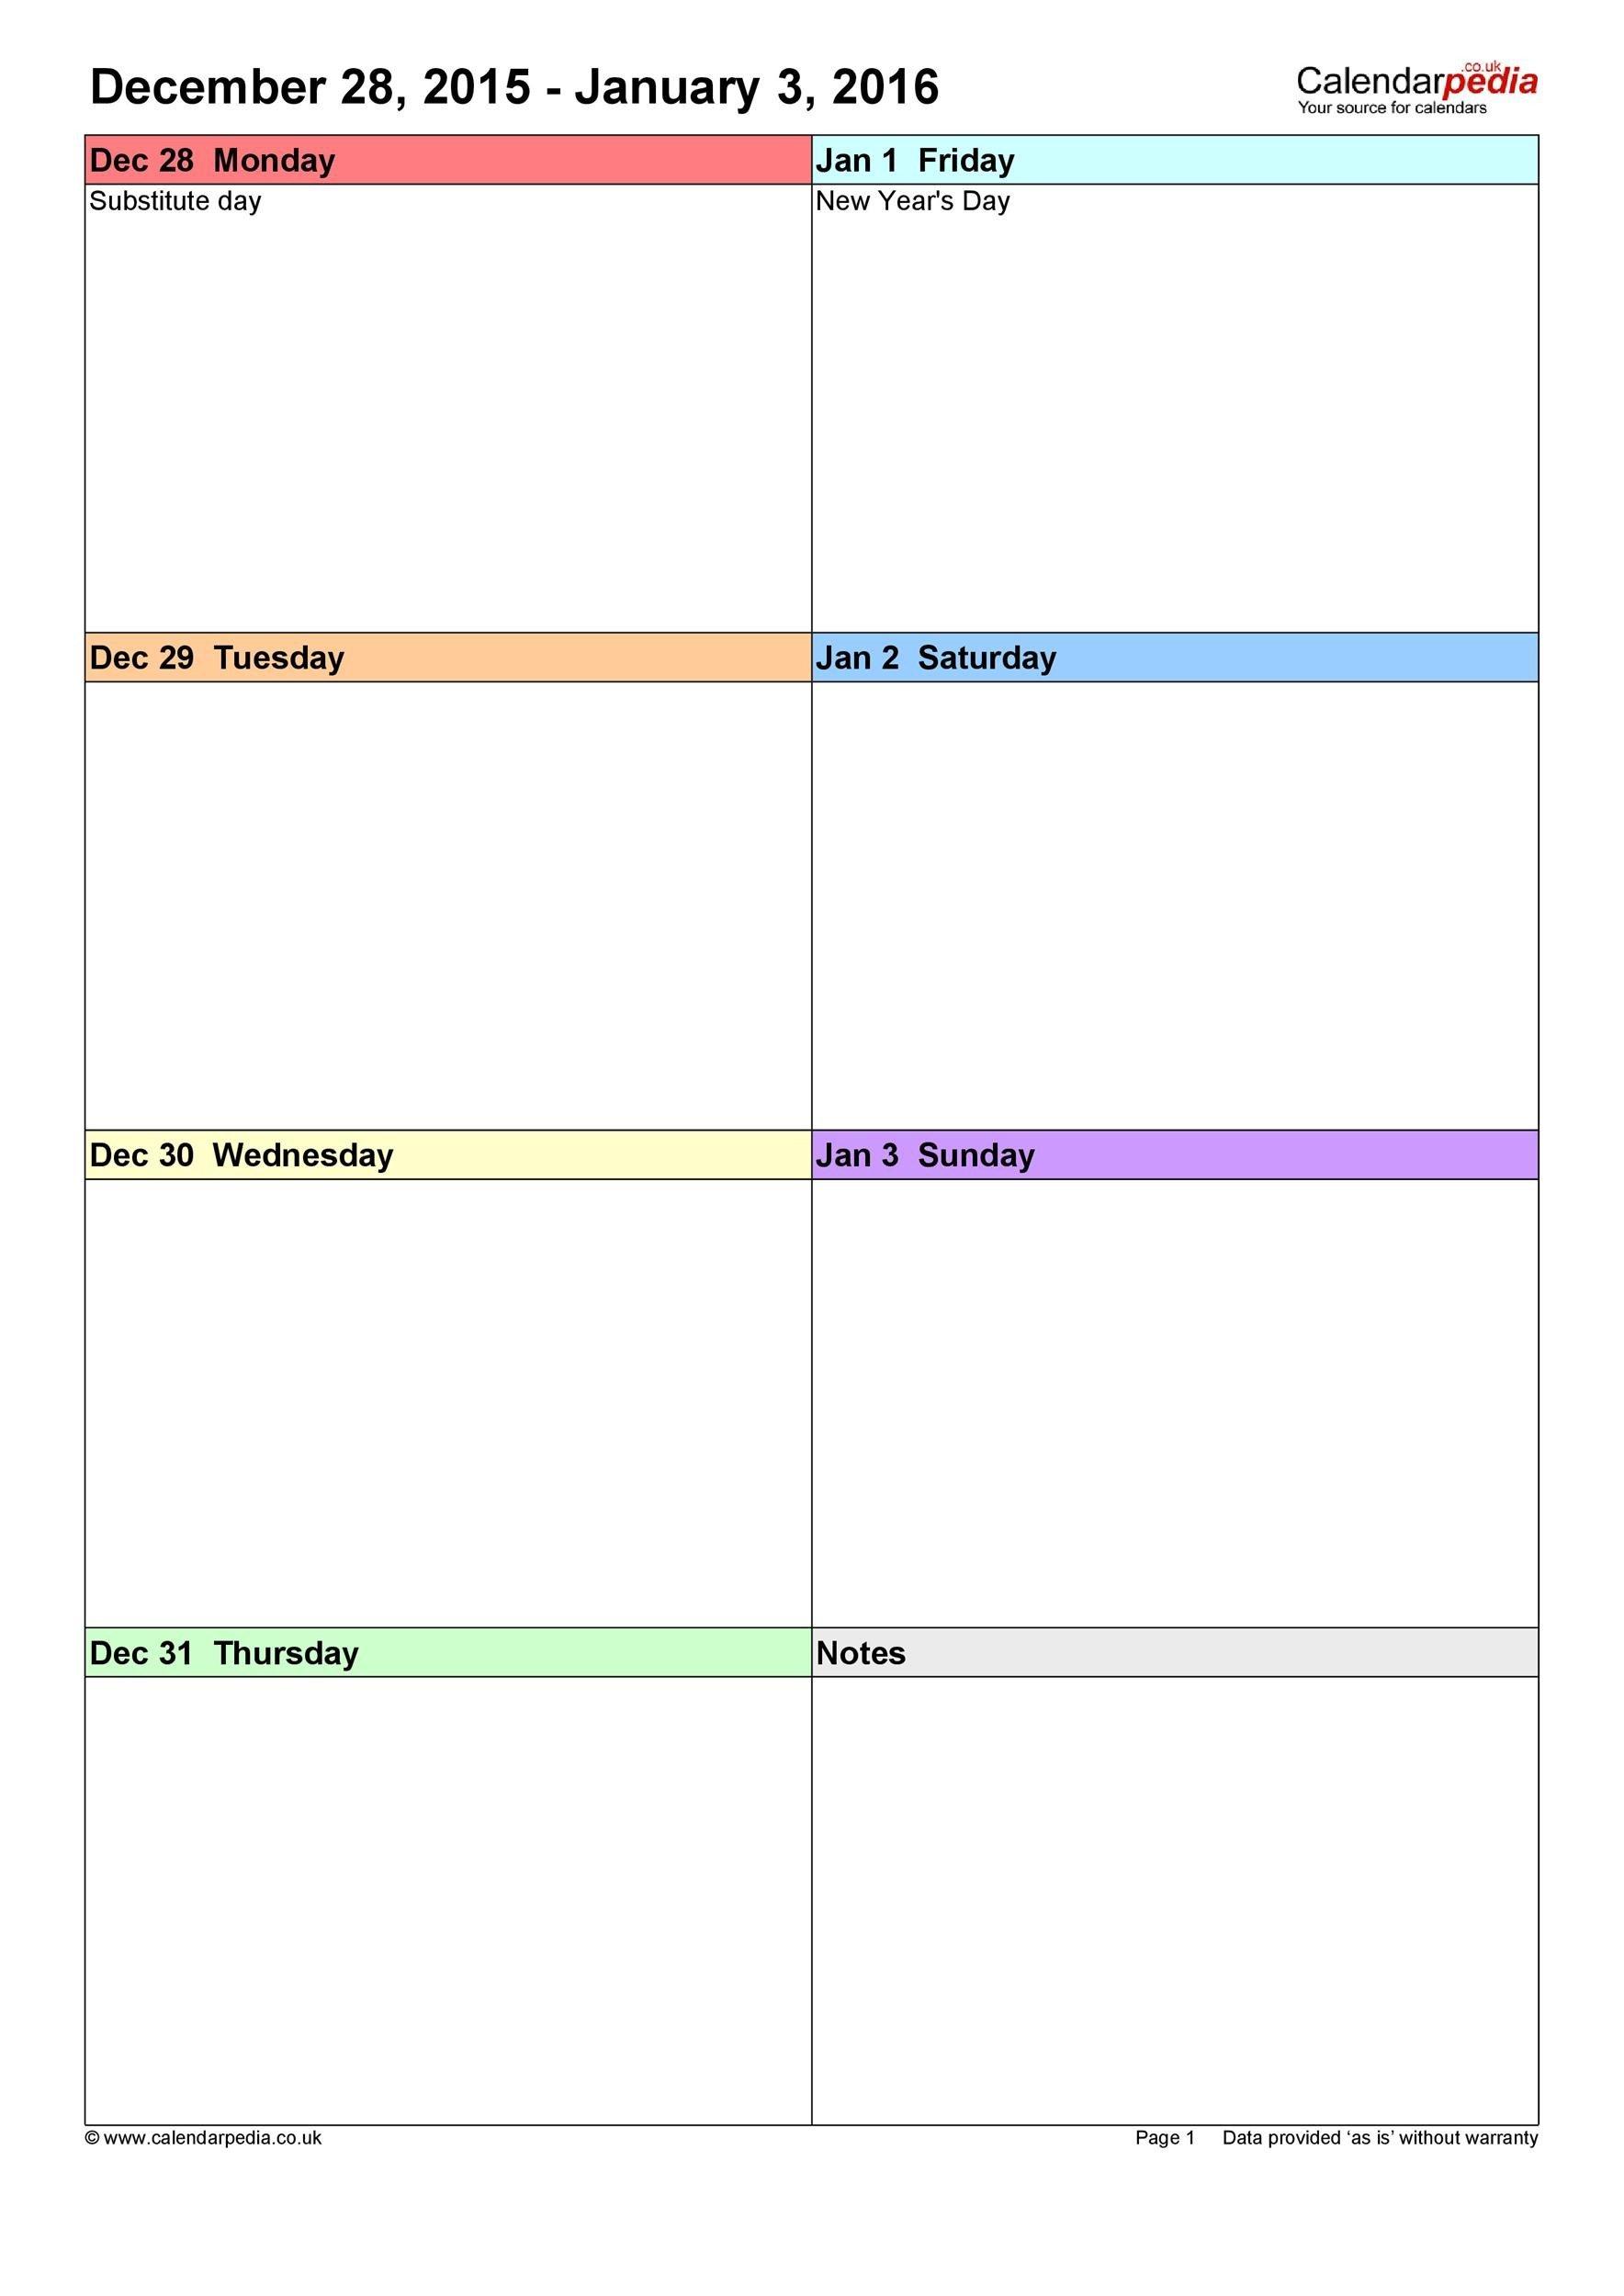 26 Blank Weekly Calendar Templates [Pdf, Excel, Word] ᐅ 7 Day Week Blank Timetable